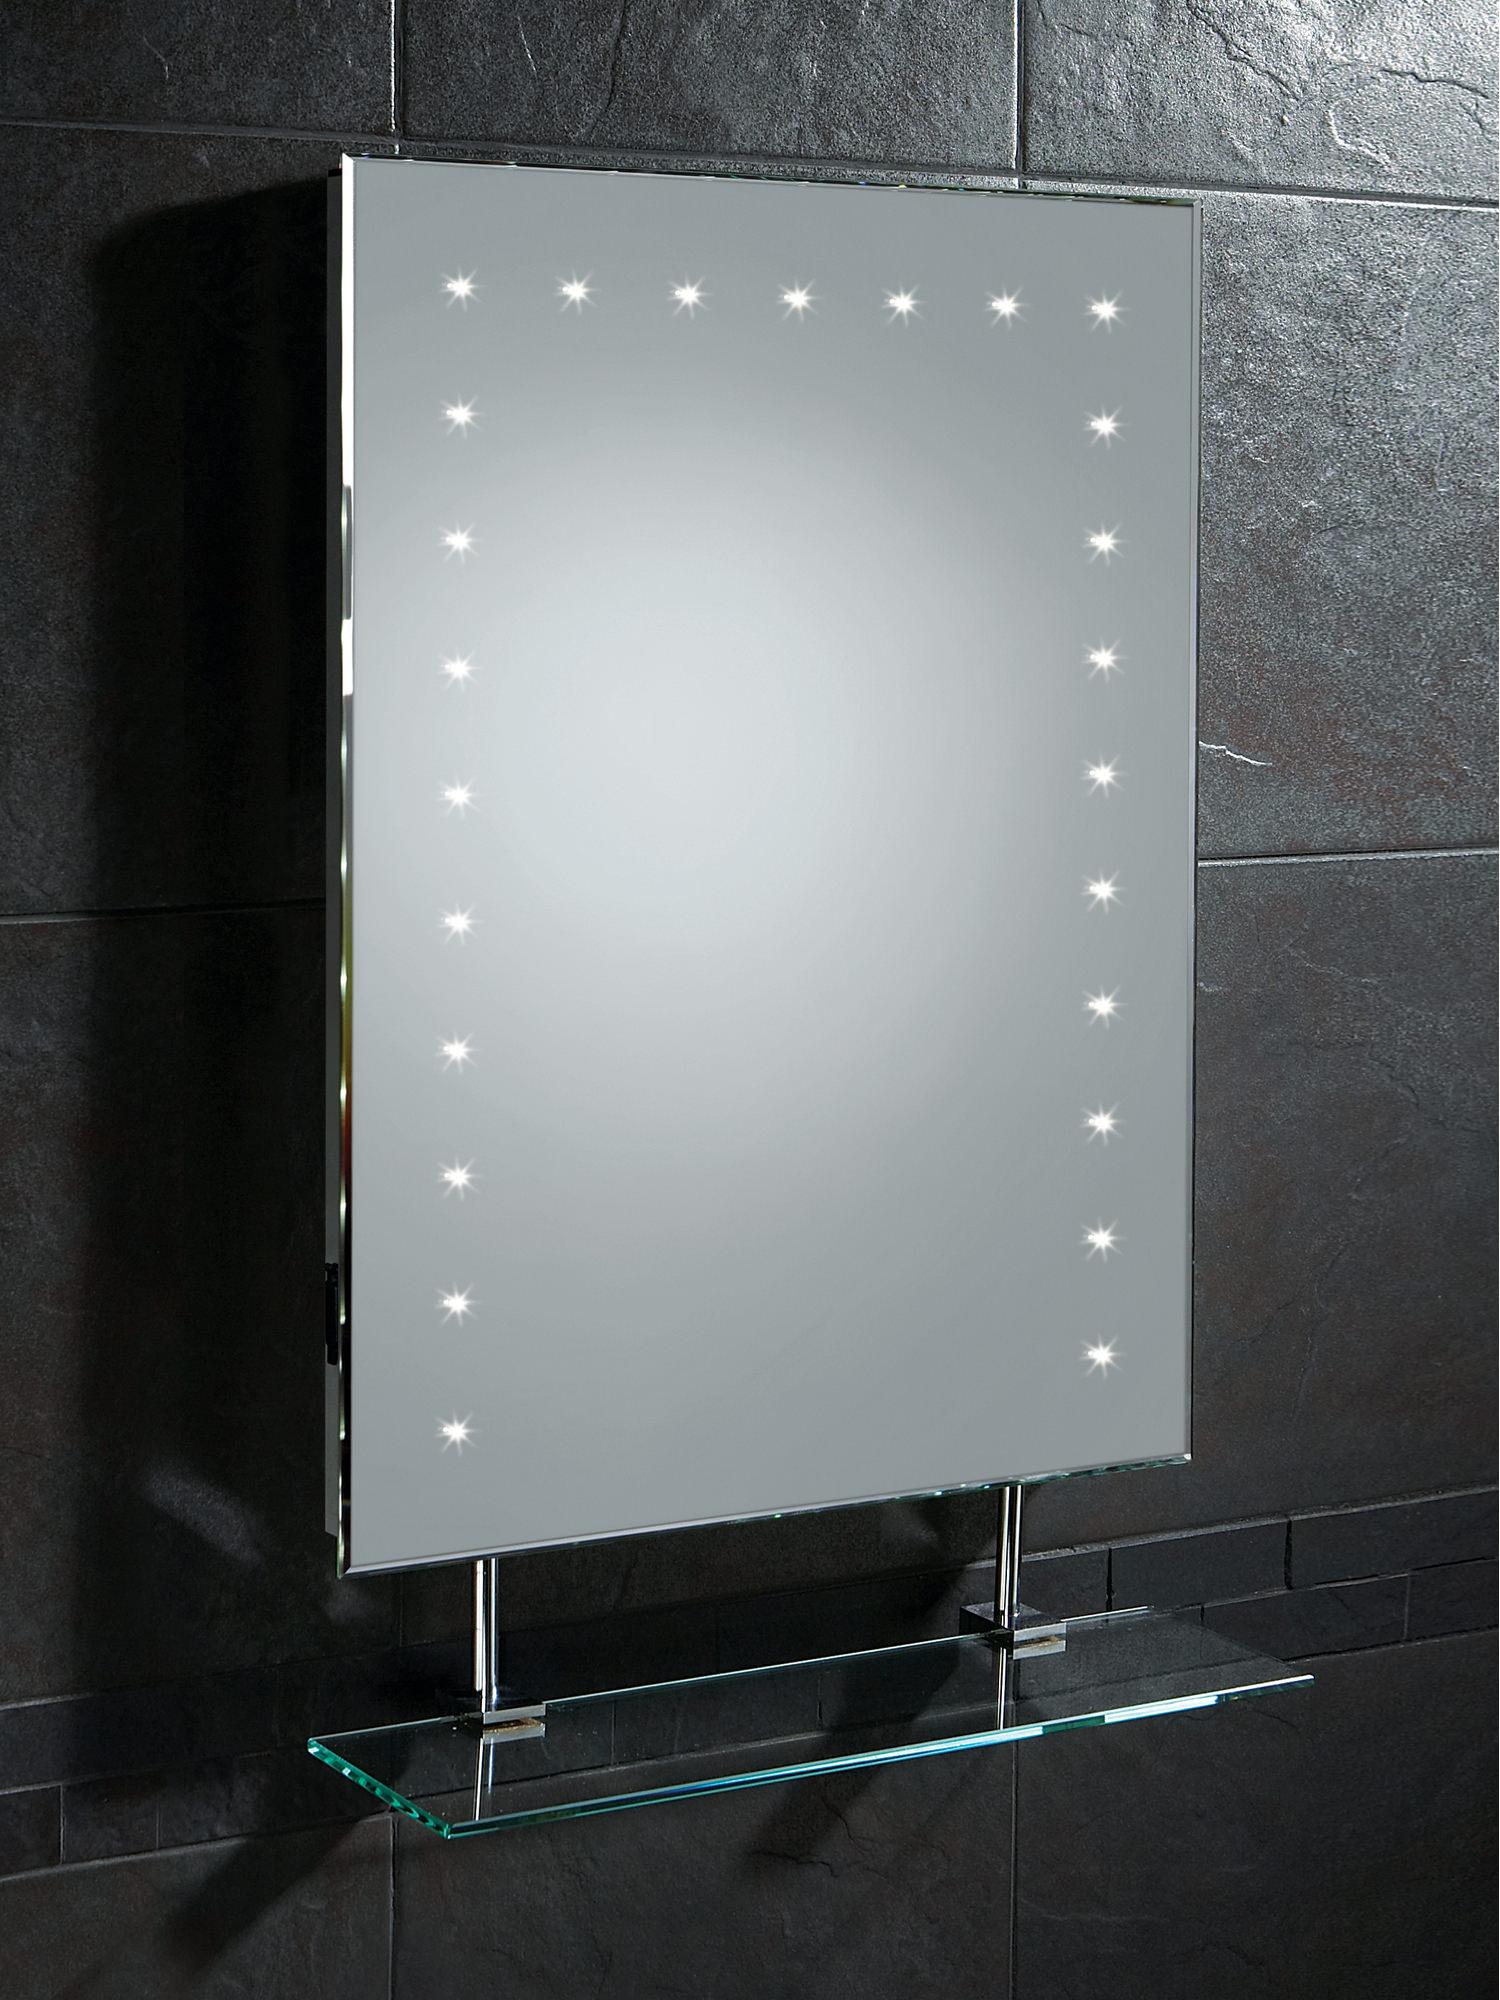 Bathroom led mirrors uk - Hib Keo Led Bathroom Mirror With Glass Shelf And Shaver Socket